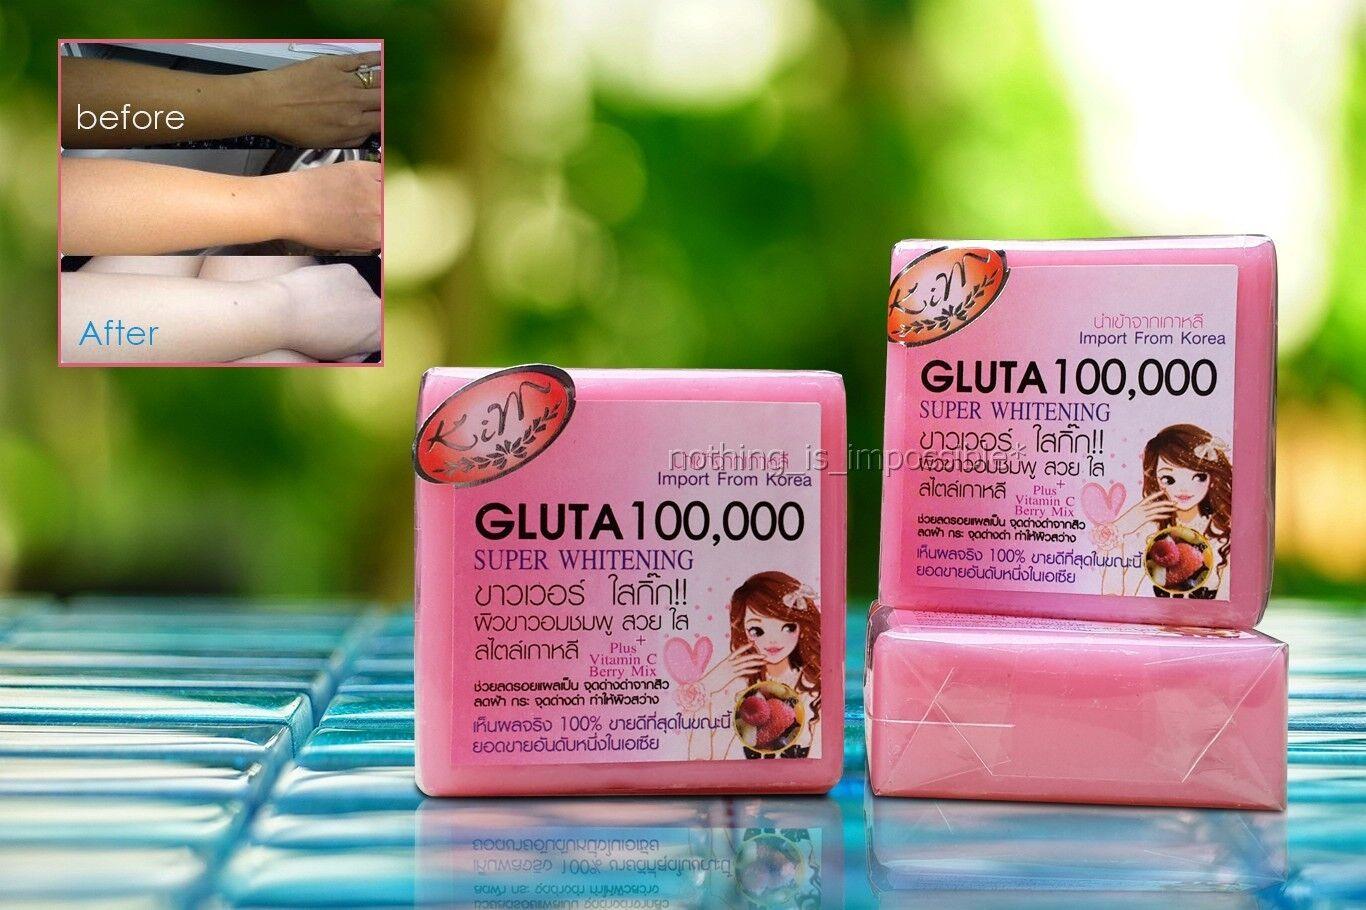 ... SOAP 3 BARS GLUTA 100000 SUPER WHITENING SKIN BLEACHING FORMULA